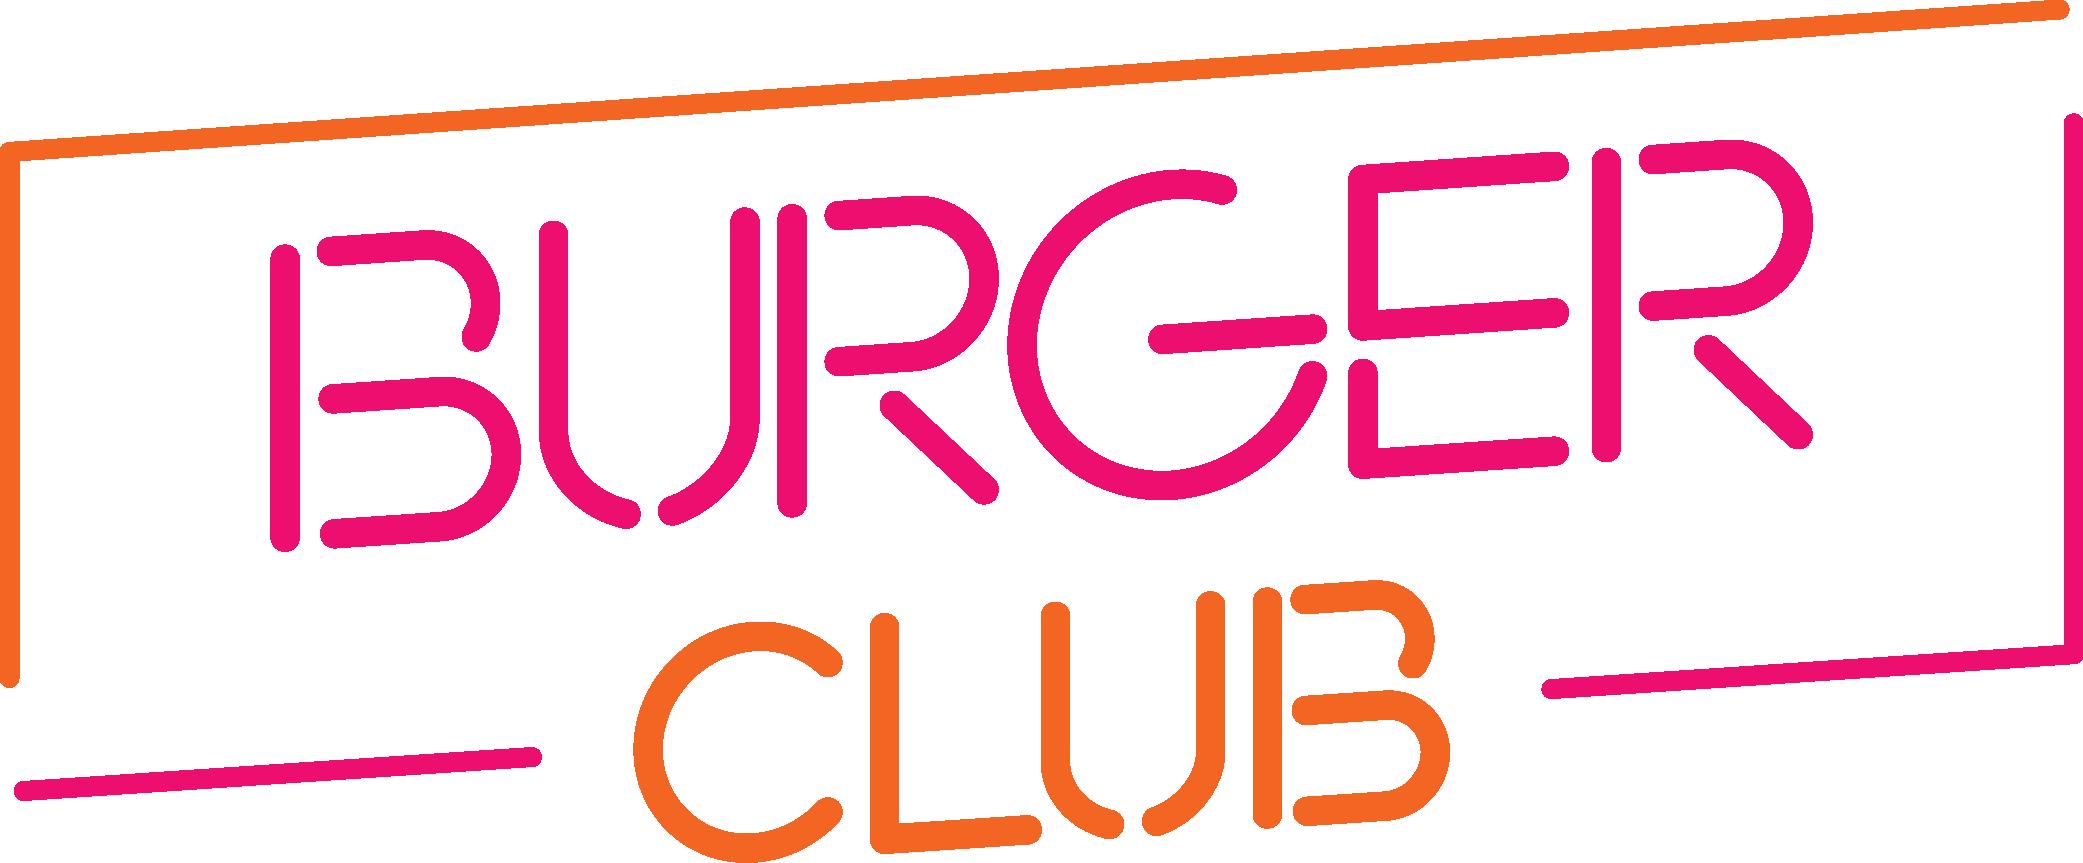 BurgerClub Logo Slanted-01.png